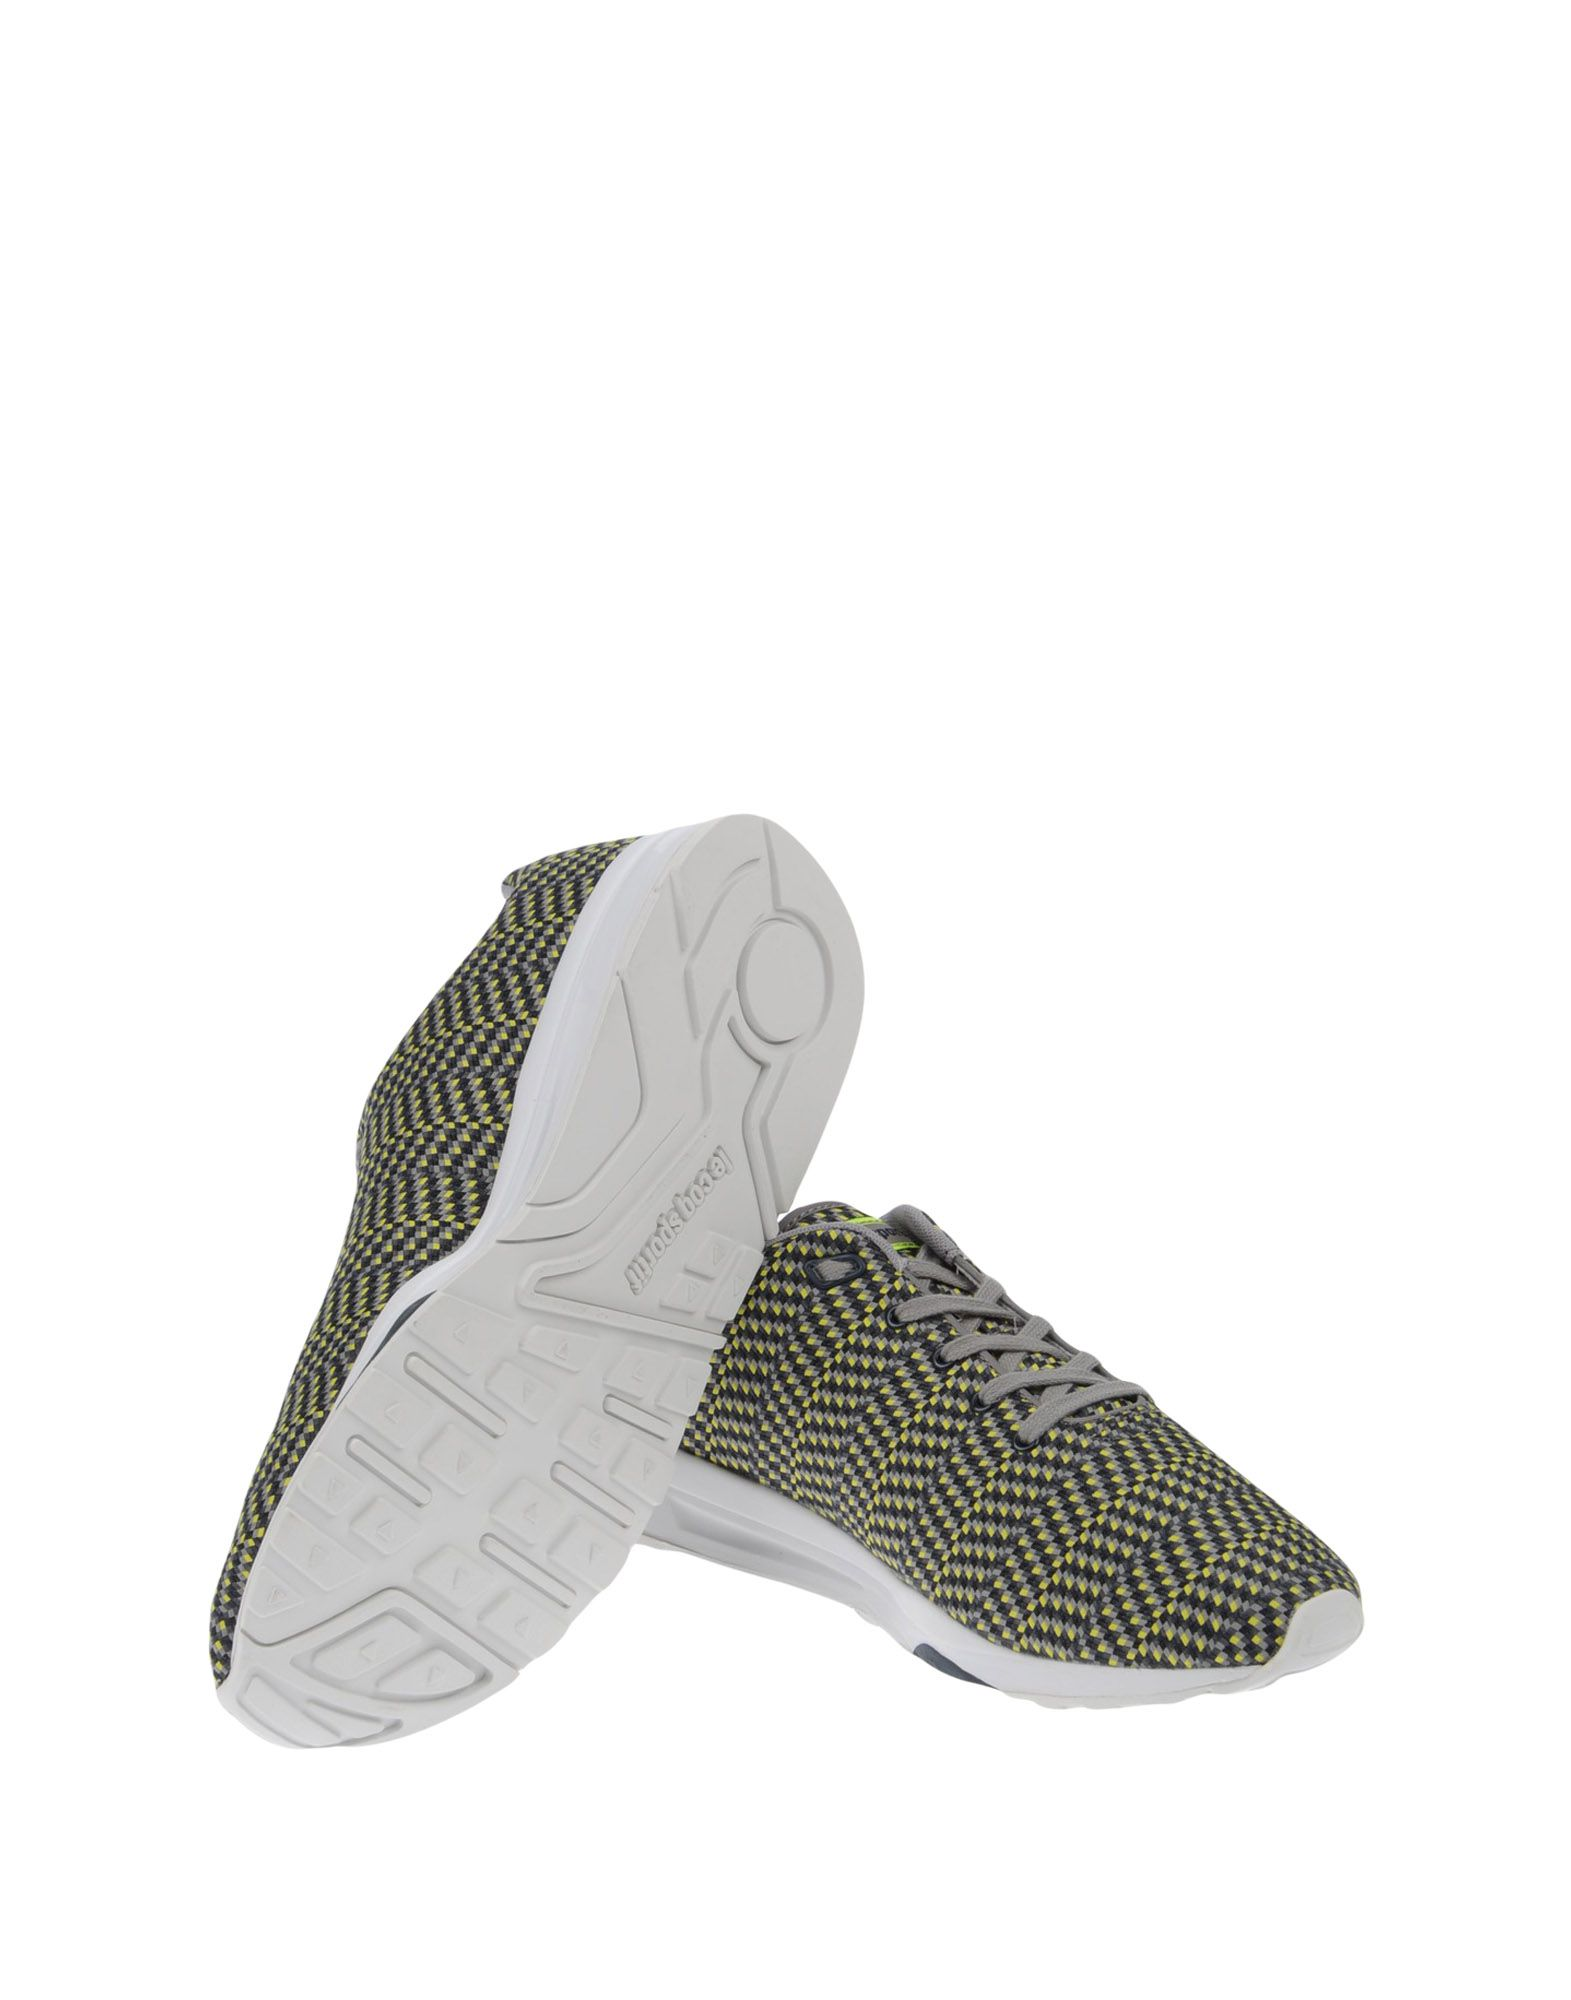 Sneakers Le Coq Sportif Lcs R950 Jacquard - Homme - Sneakers Le Coq Sportif sur